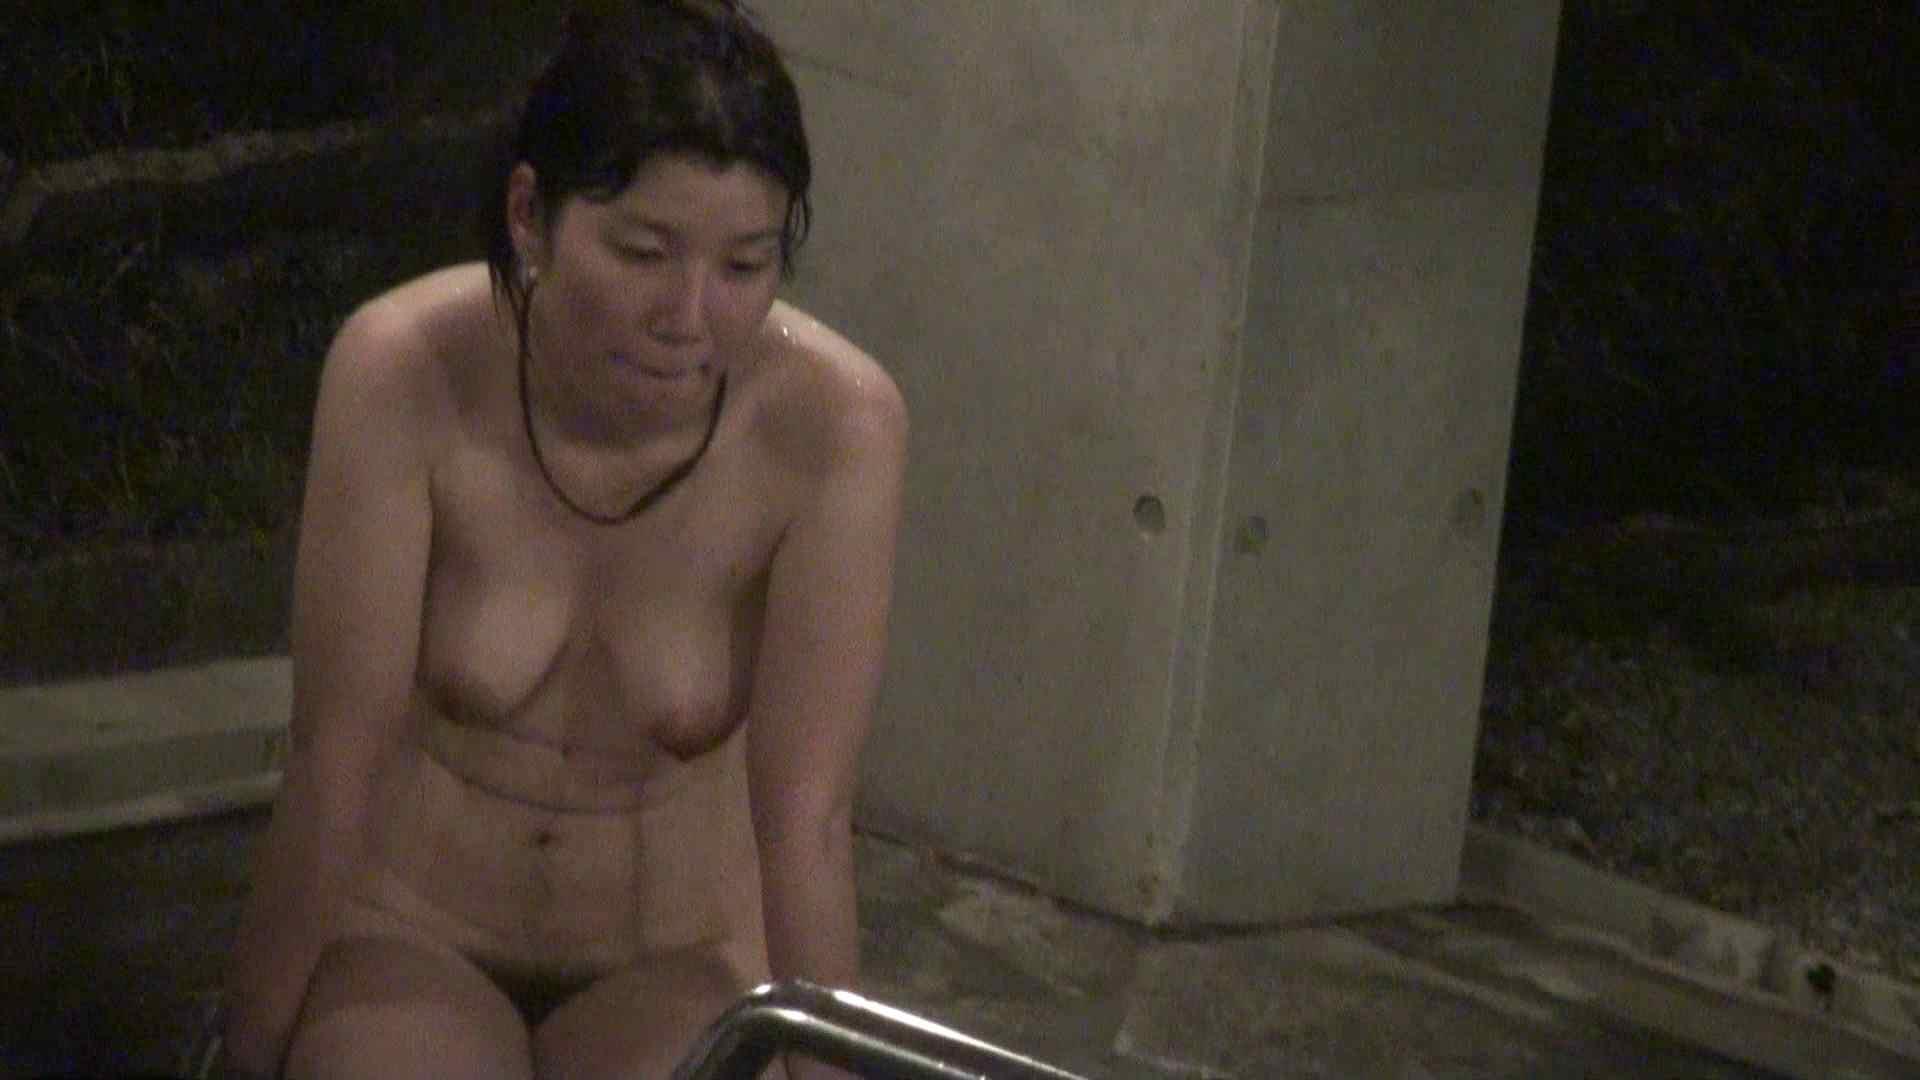 Aquaな露天風呂Vol.419 盗撮 | OLセックス  99画像 85